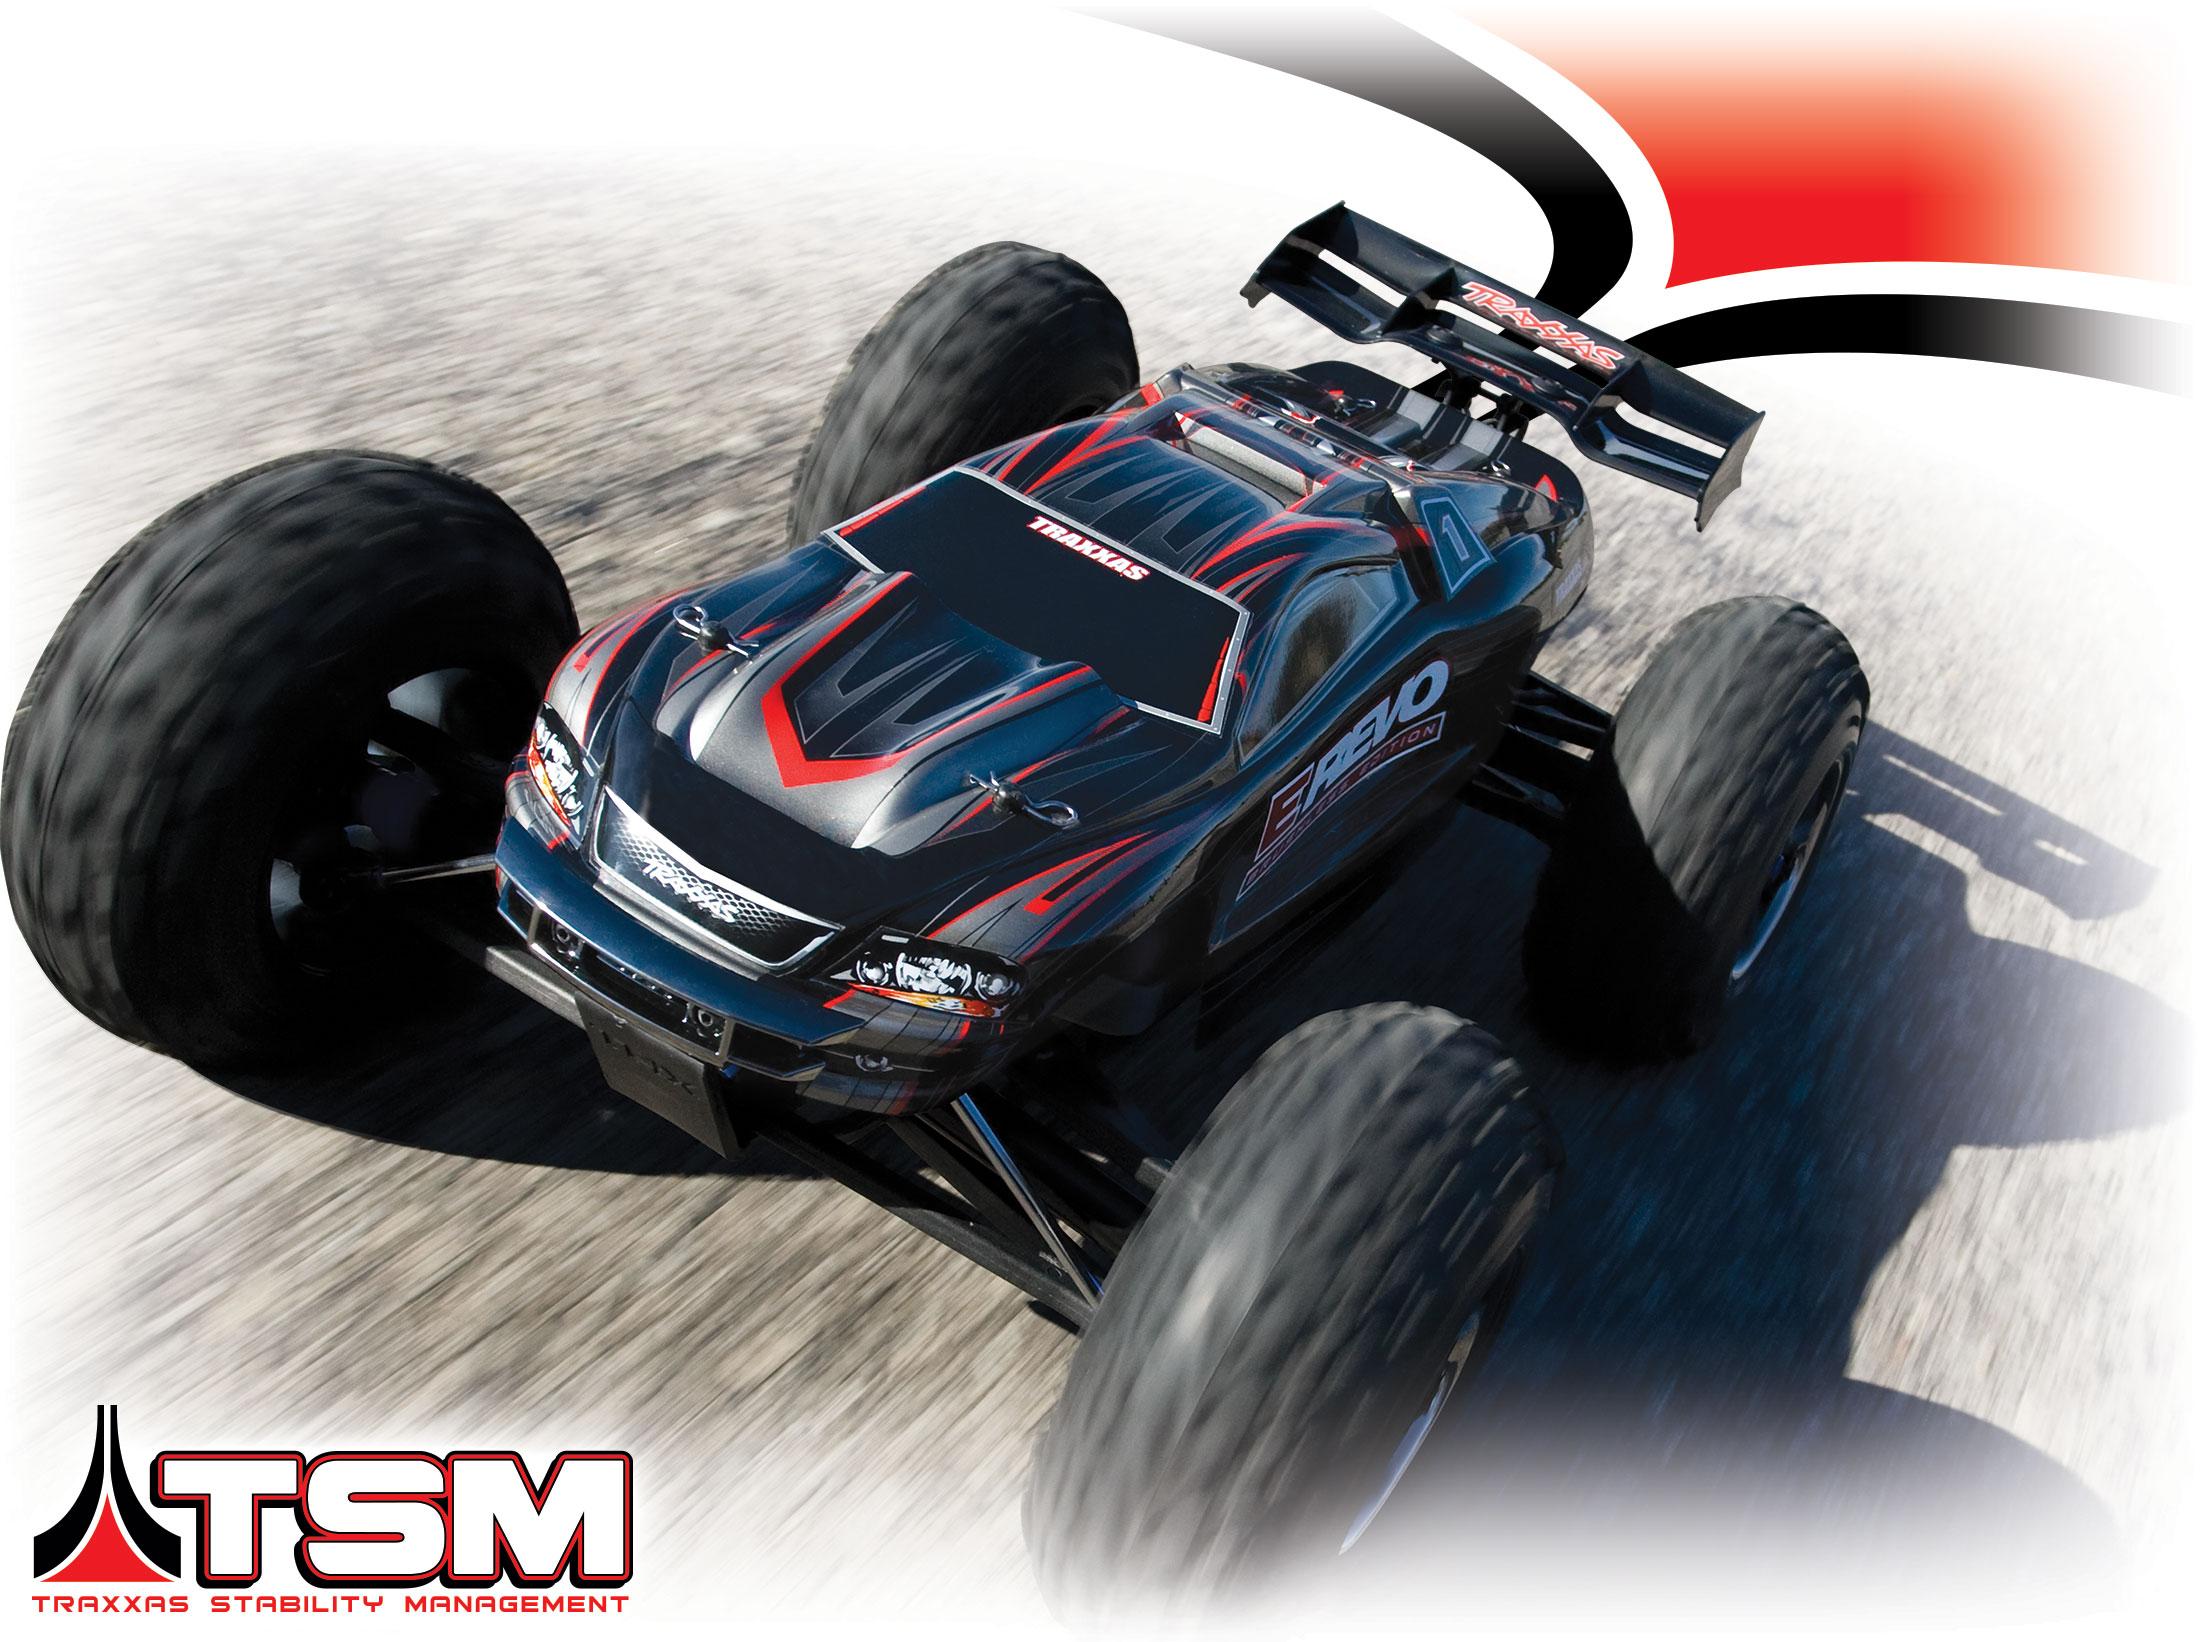 56087-3-action-TSM